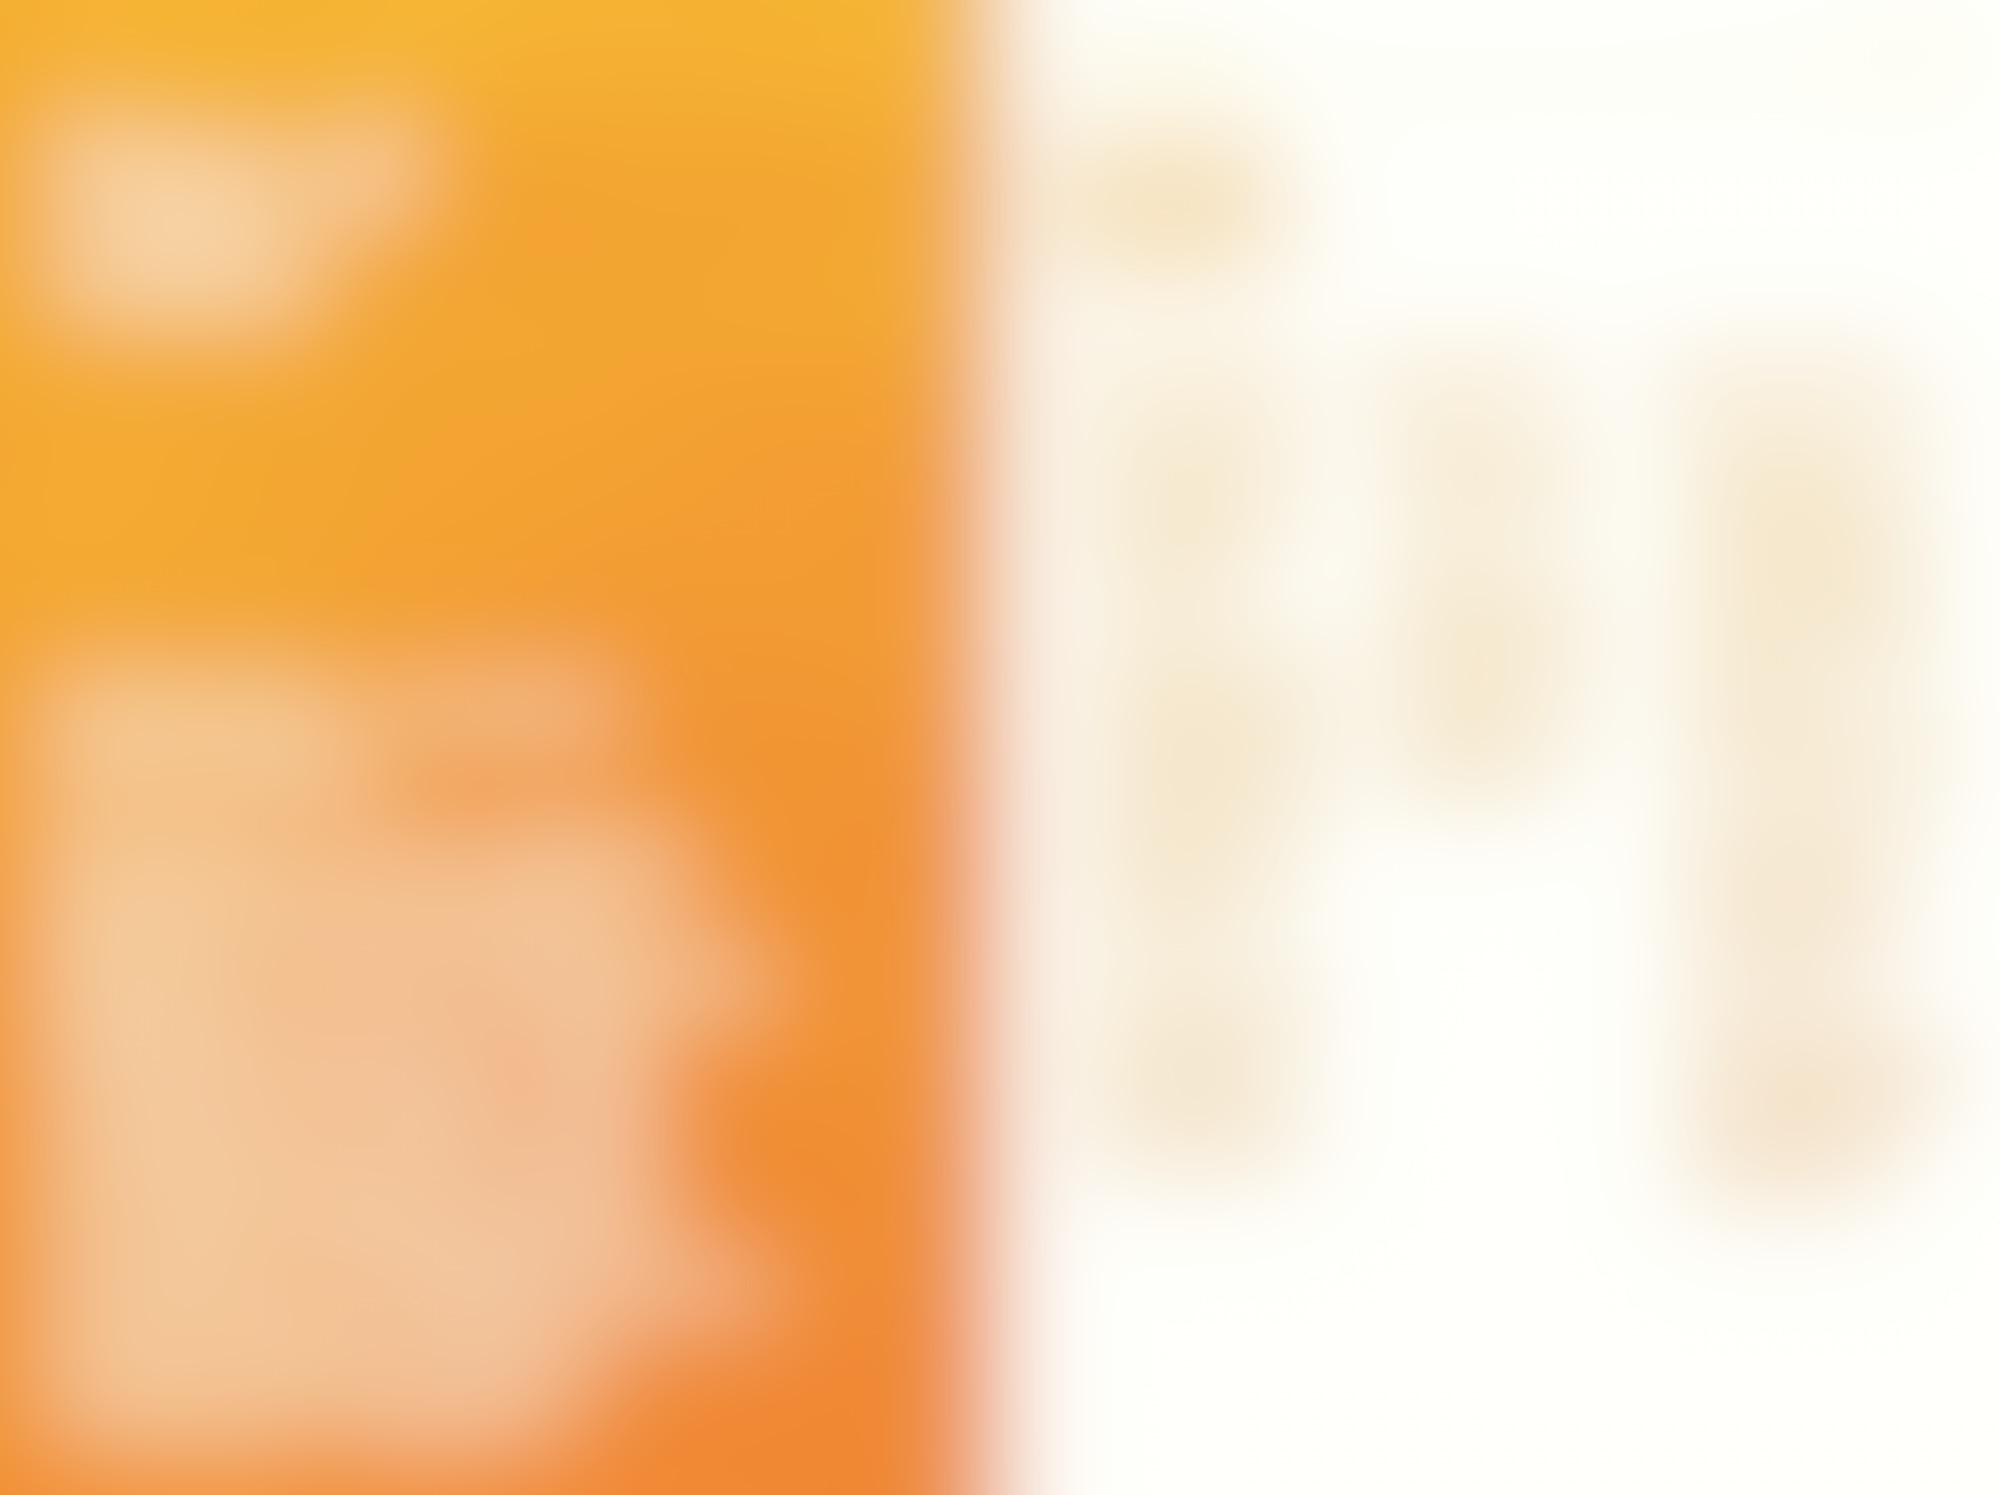 Danone 06 autocompressfitresizeixlibphp 1 1 0max h2000max w3 D2000q80s2171110830aacb7d8737bf2c47a9369d